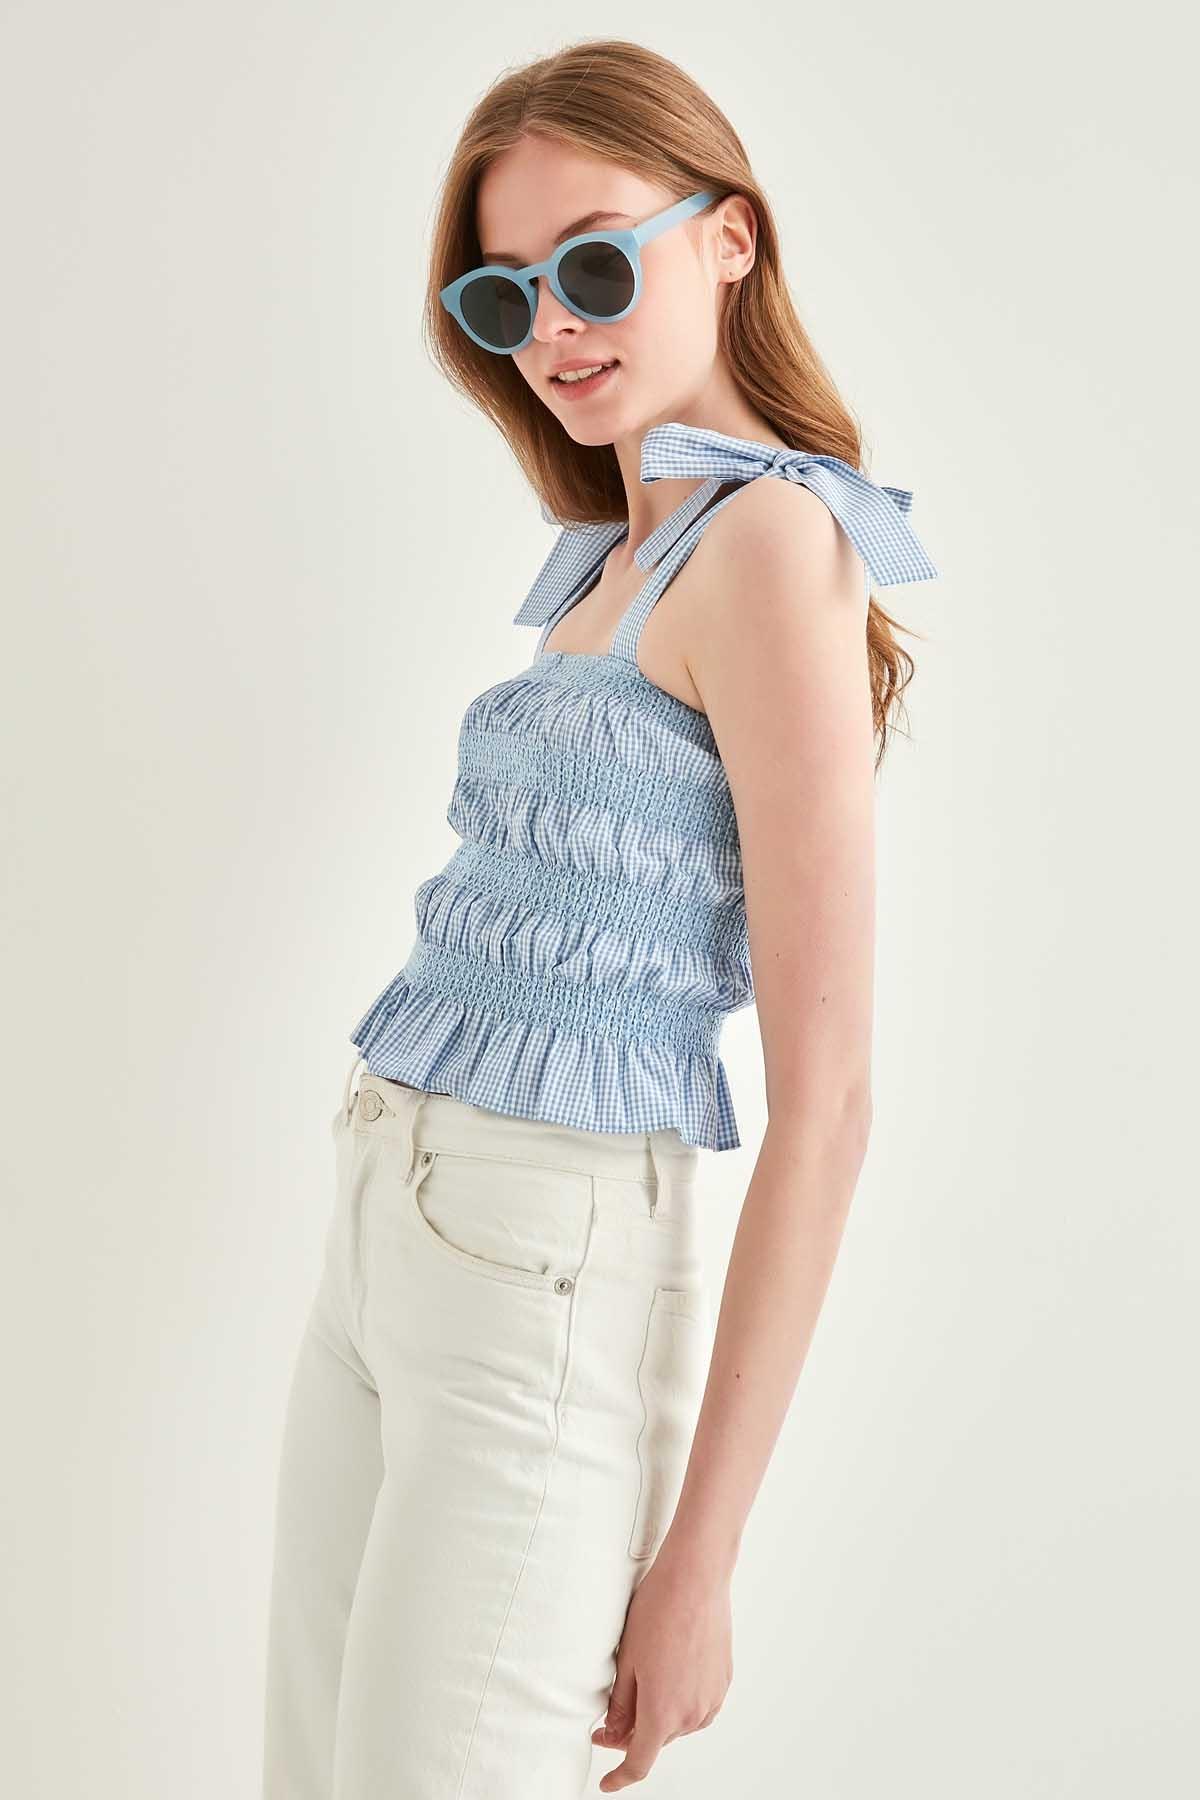 Kroşeta Nakış Detaylı Çizgili Askılı Bluz - Thumbnail